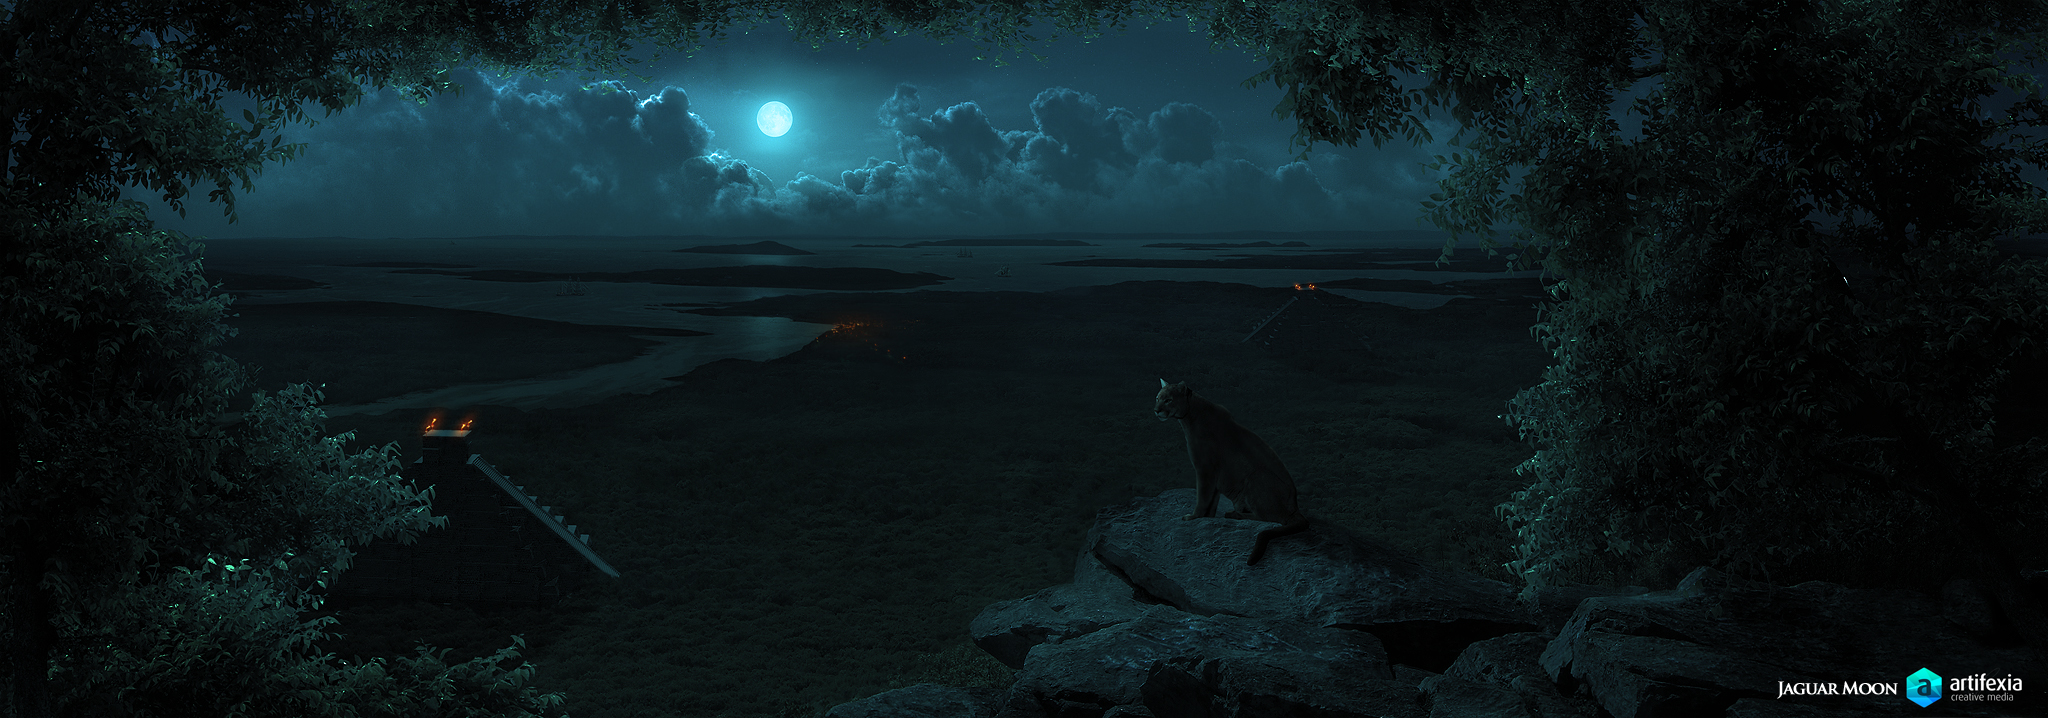 Jaguar Moon by Brukhar